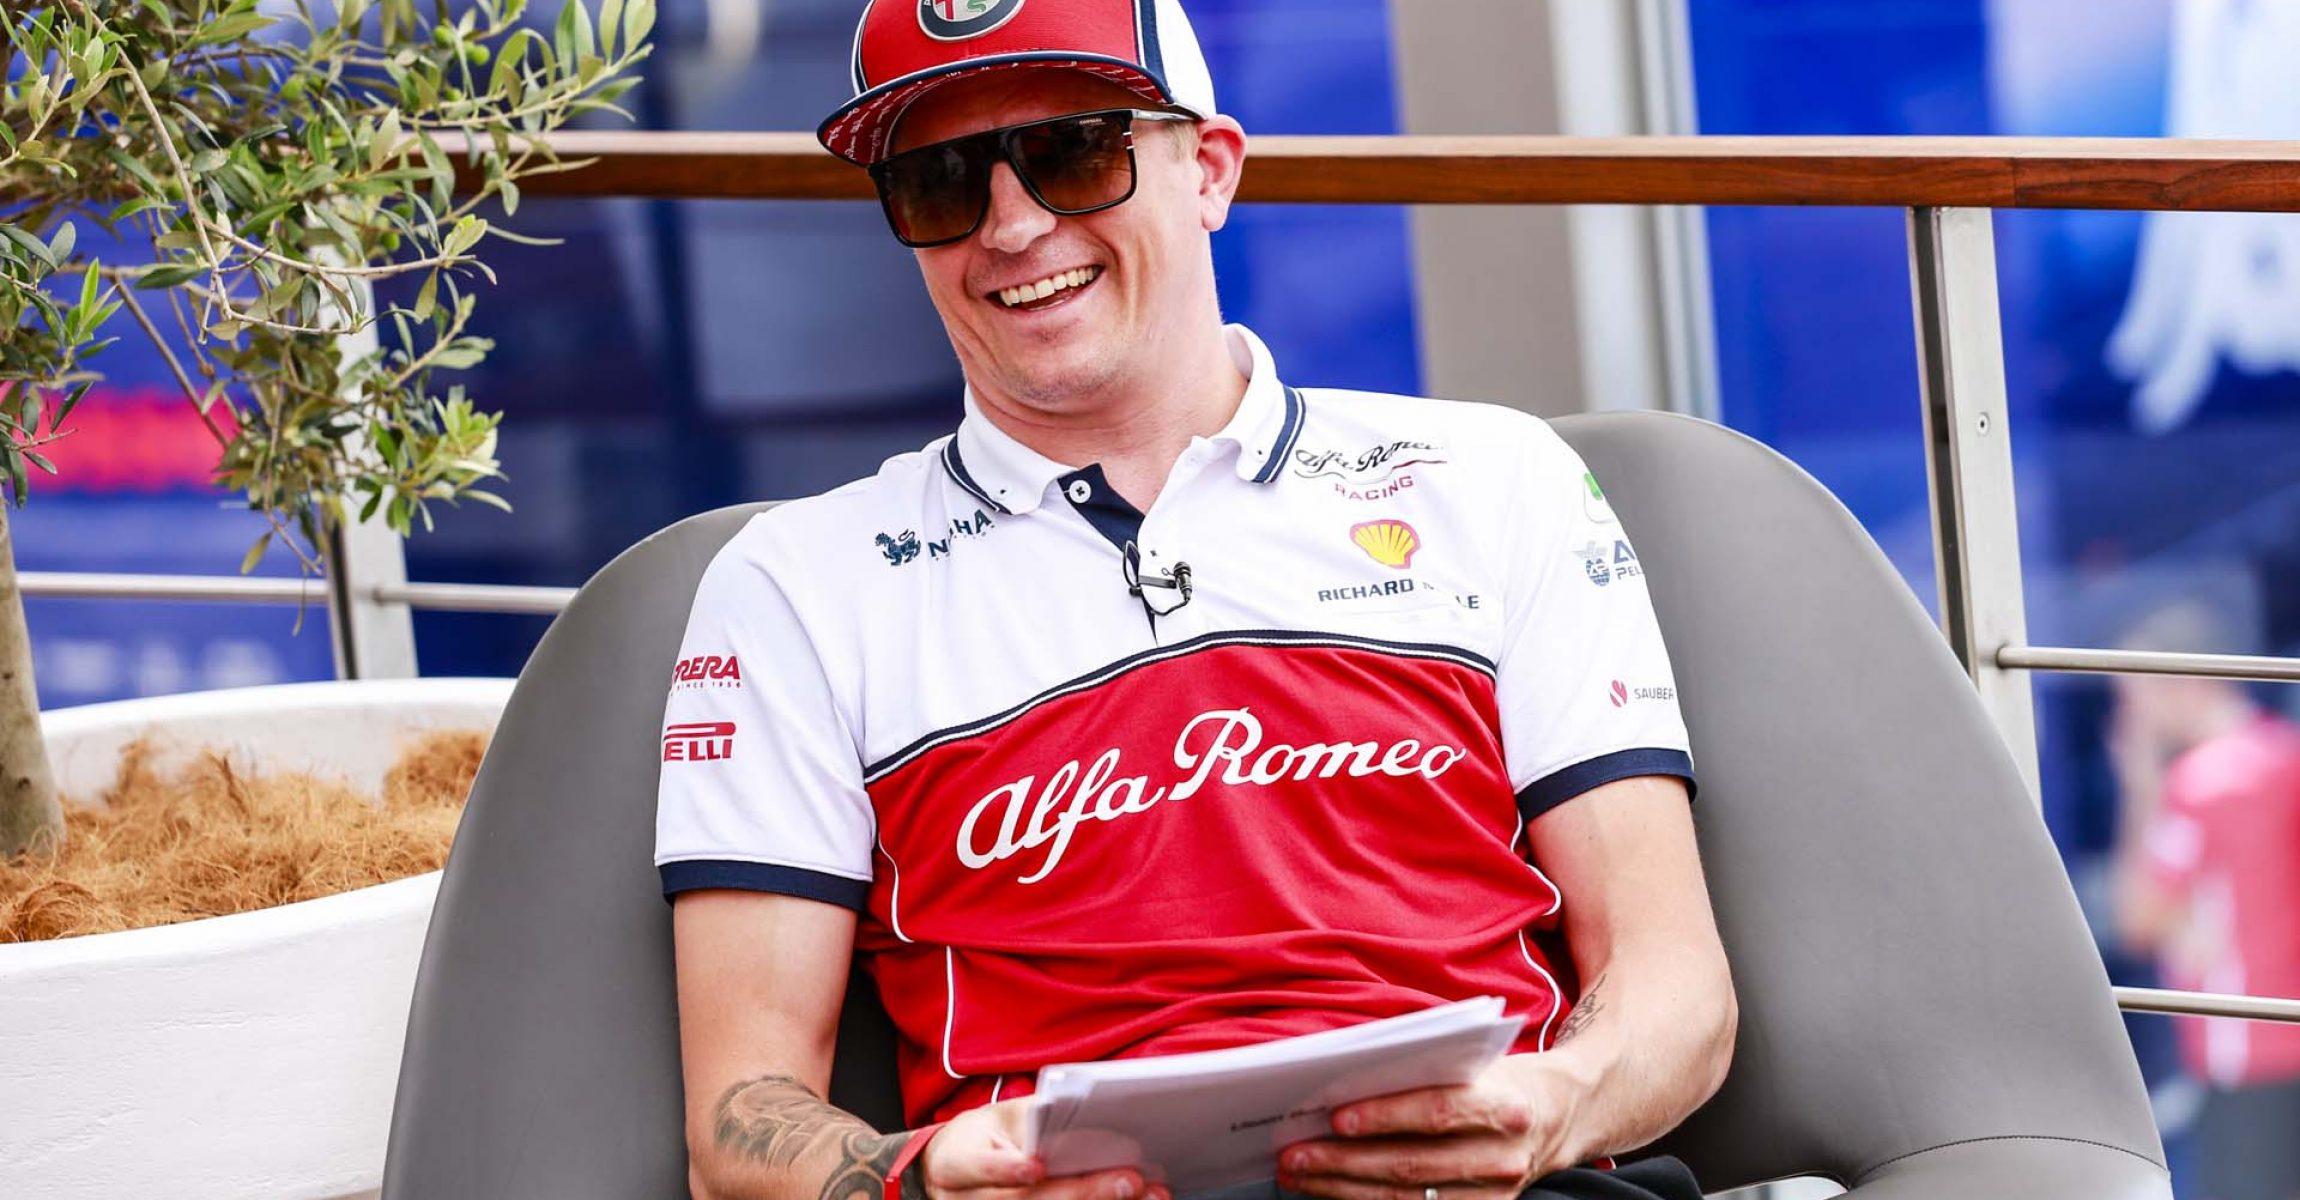 RAIKKONEN Kimi Räikkönen (fin), Alfa Romeo Racing C38, portrait during the 2019 Formula One World Championship, Germany Grand Prix from July 25 to 28, in Hockenheim, Germany - Photo Xavi Bonilla / DPPI